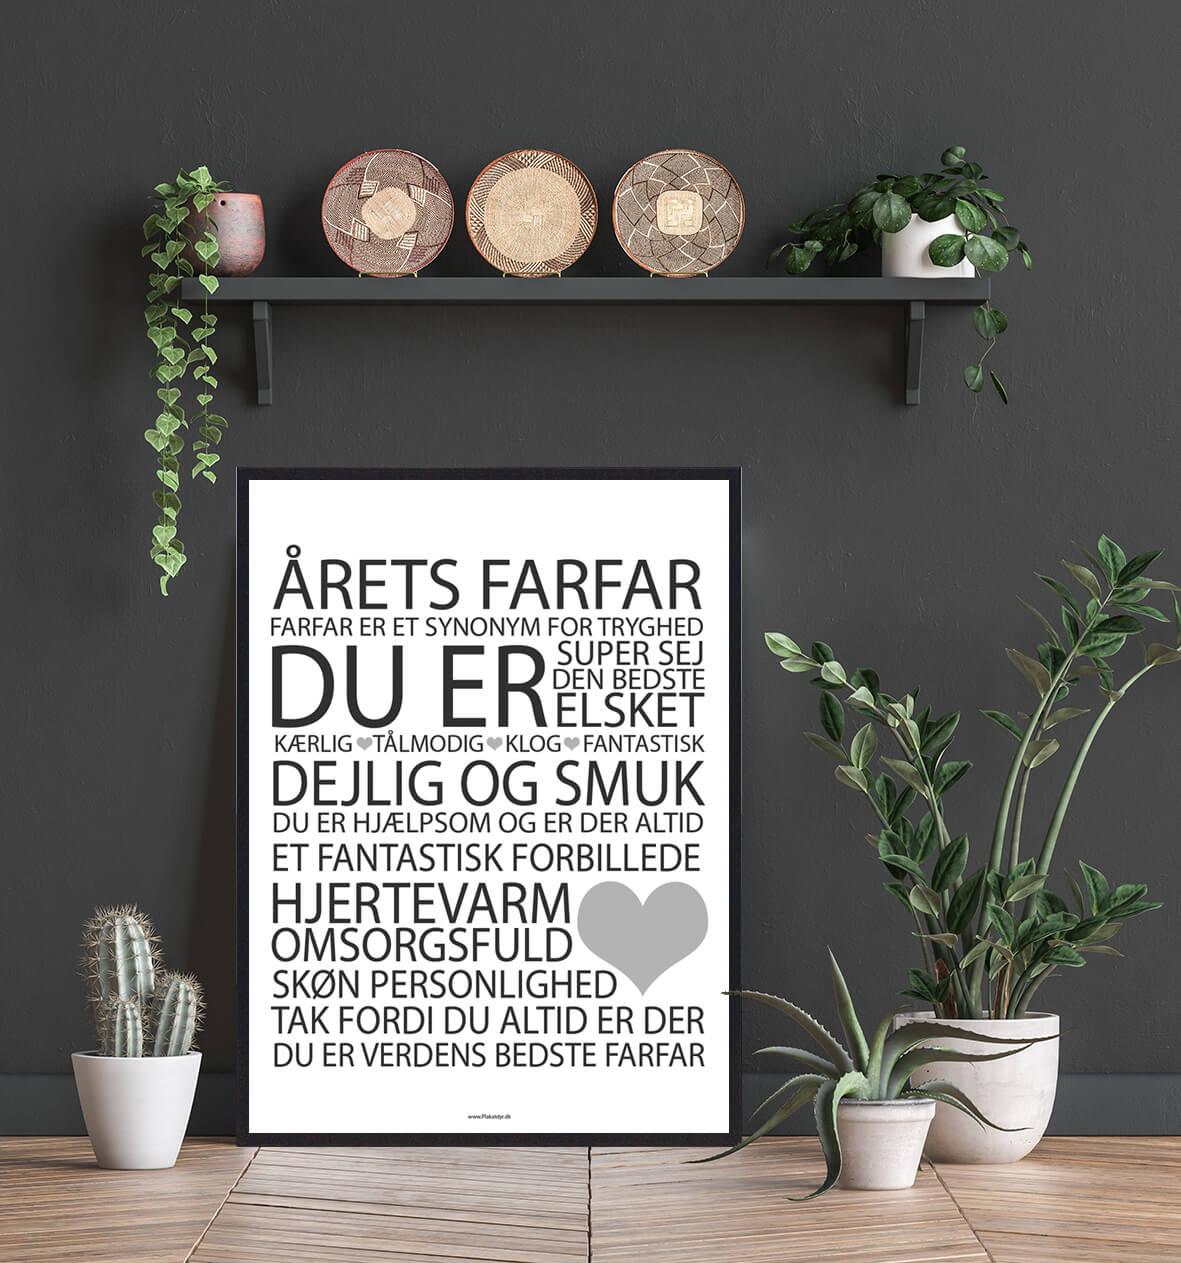 Aarets-farfar-plakat-2